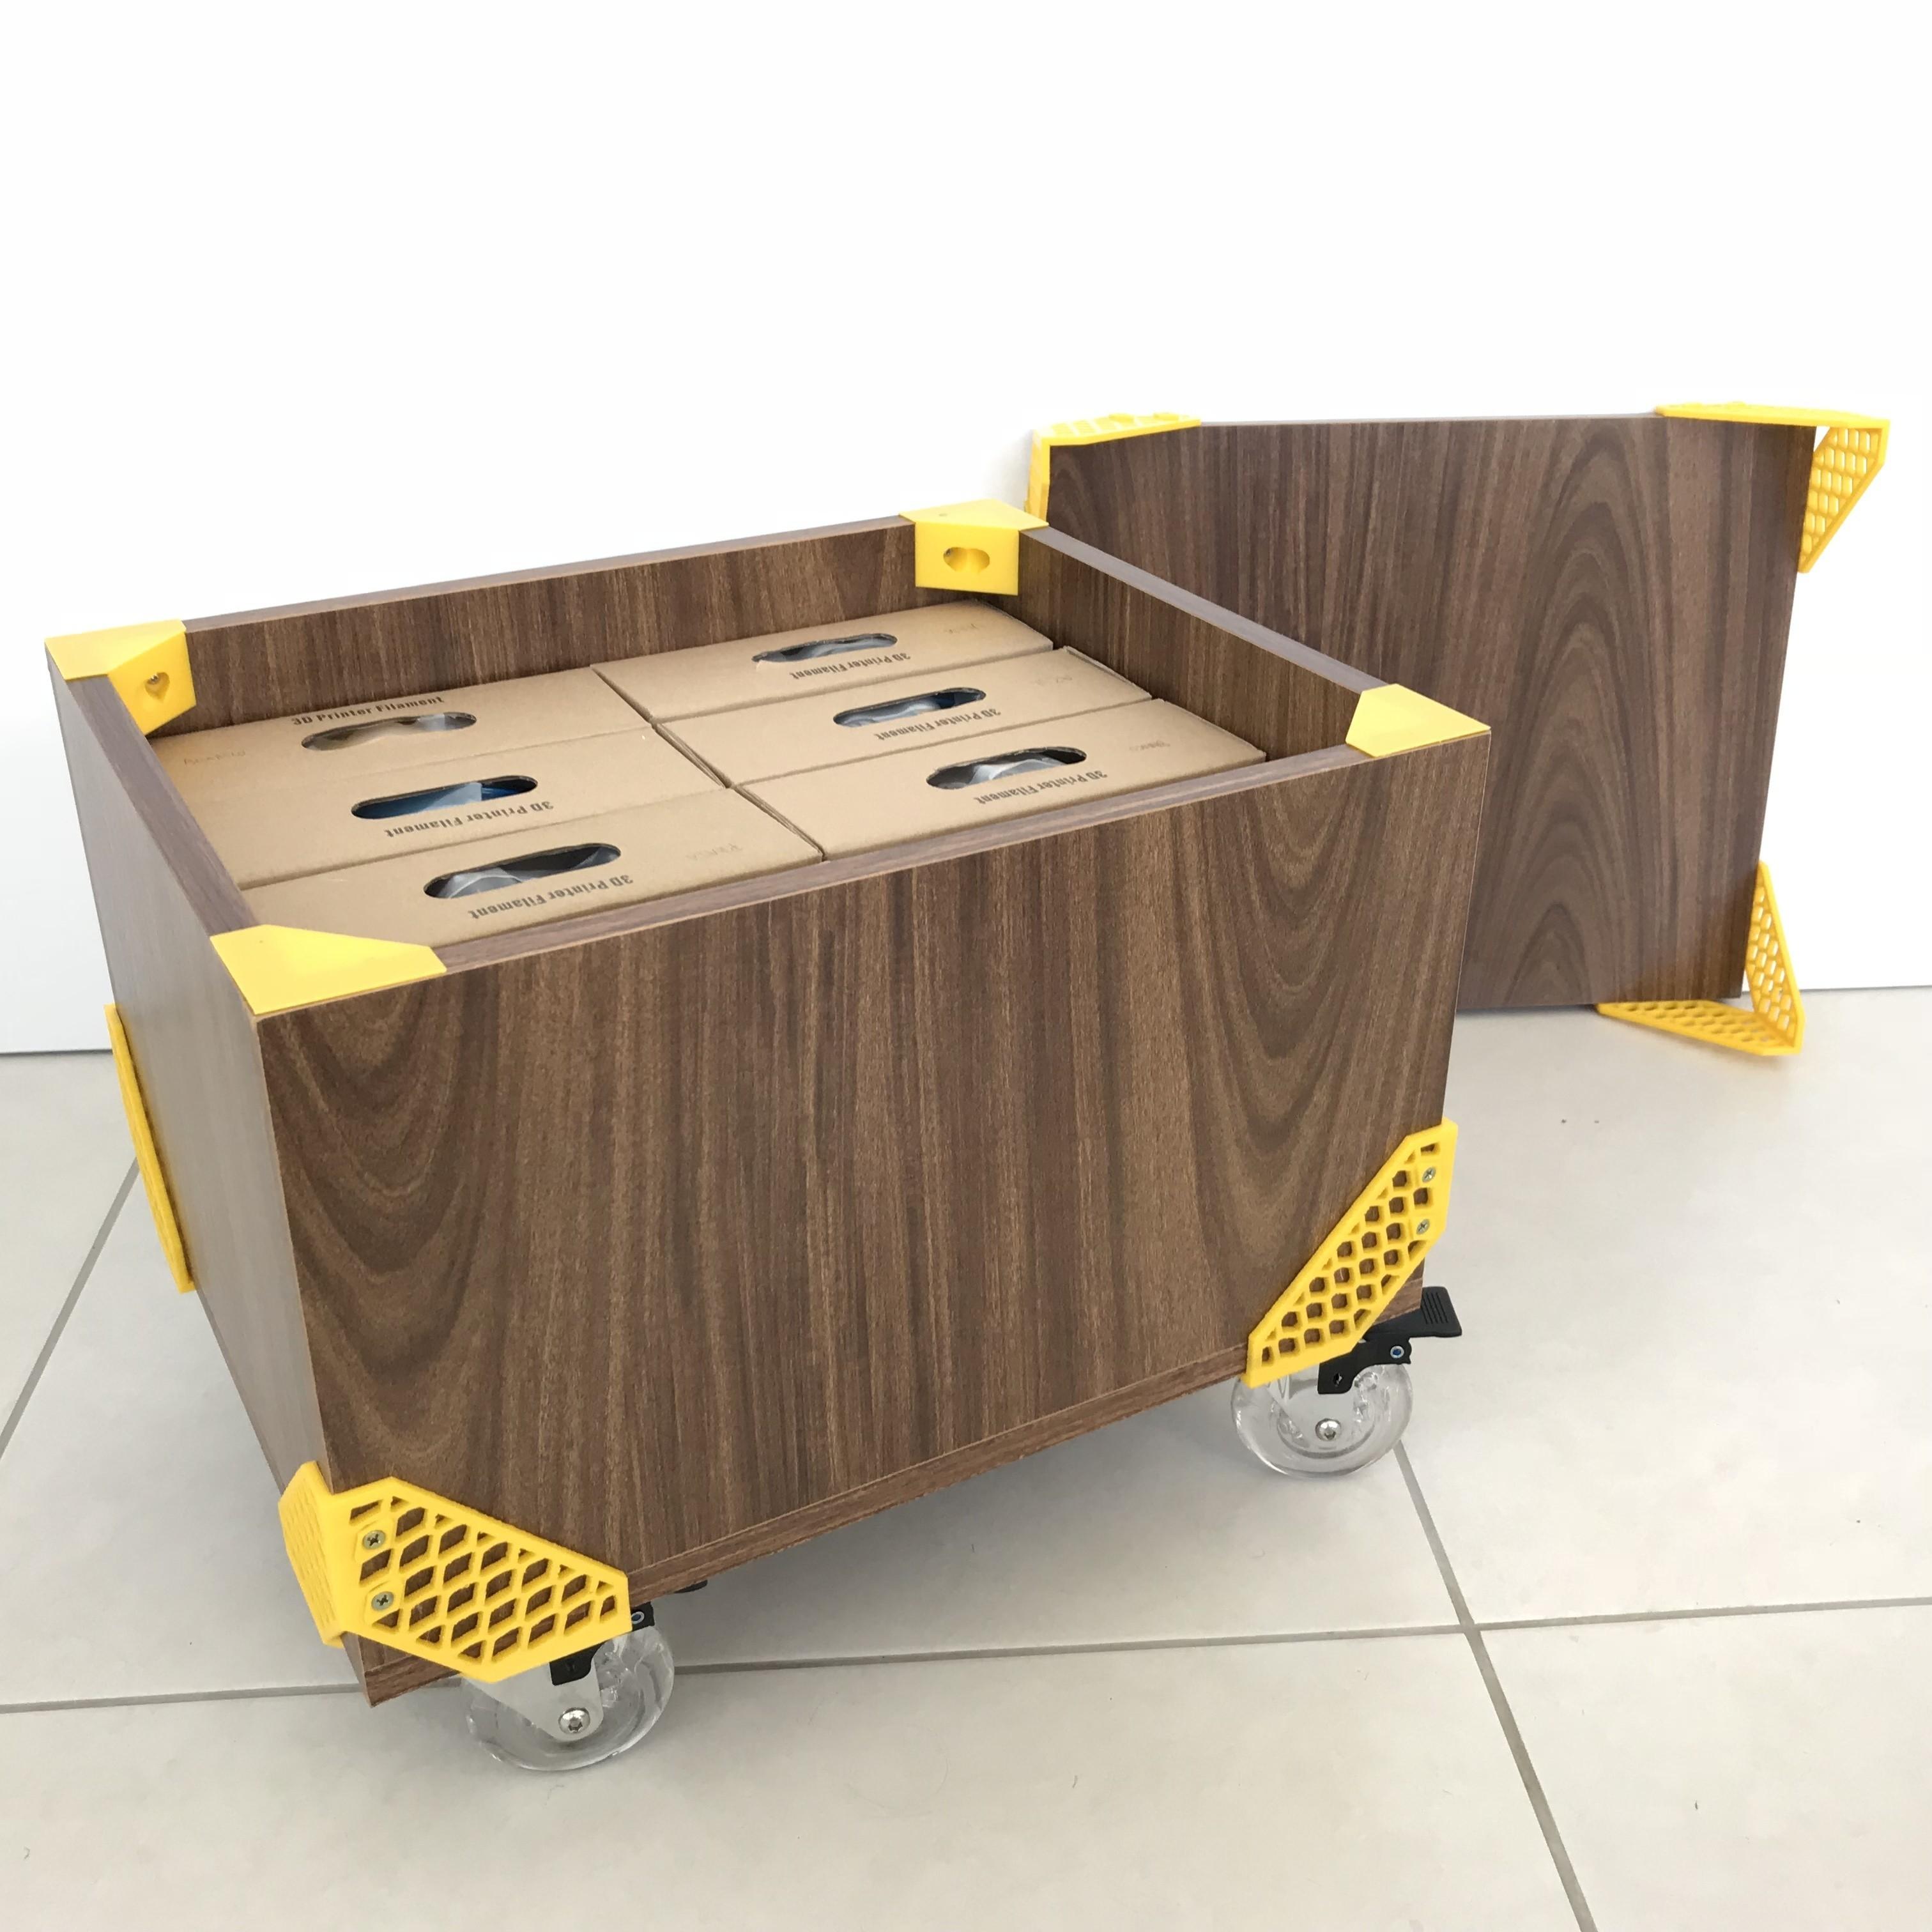 Mateus Machado_Cantoneira Trama _Print Mobi_03.JPG Download free STL file Furniture Cantoneiras Trama Print Mobi • 3D printing template, mateusmachado